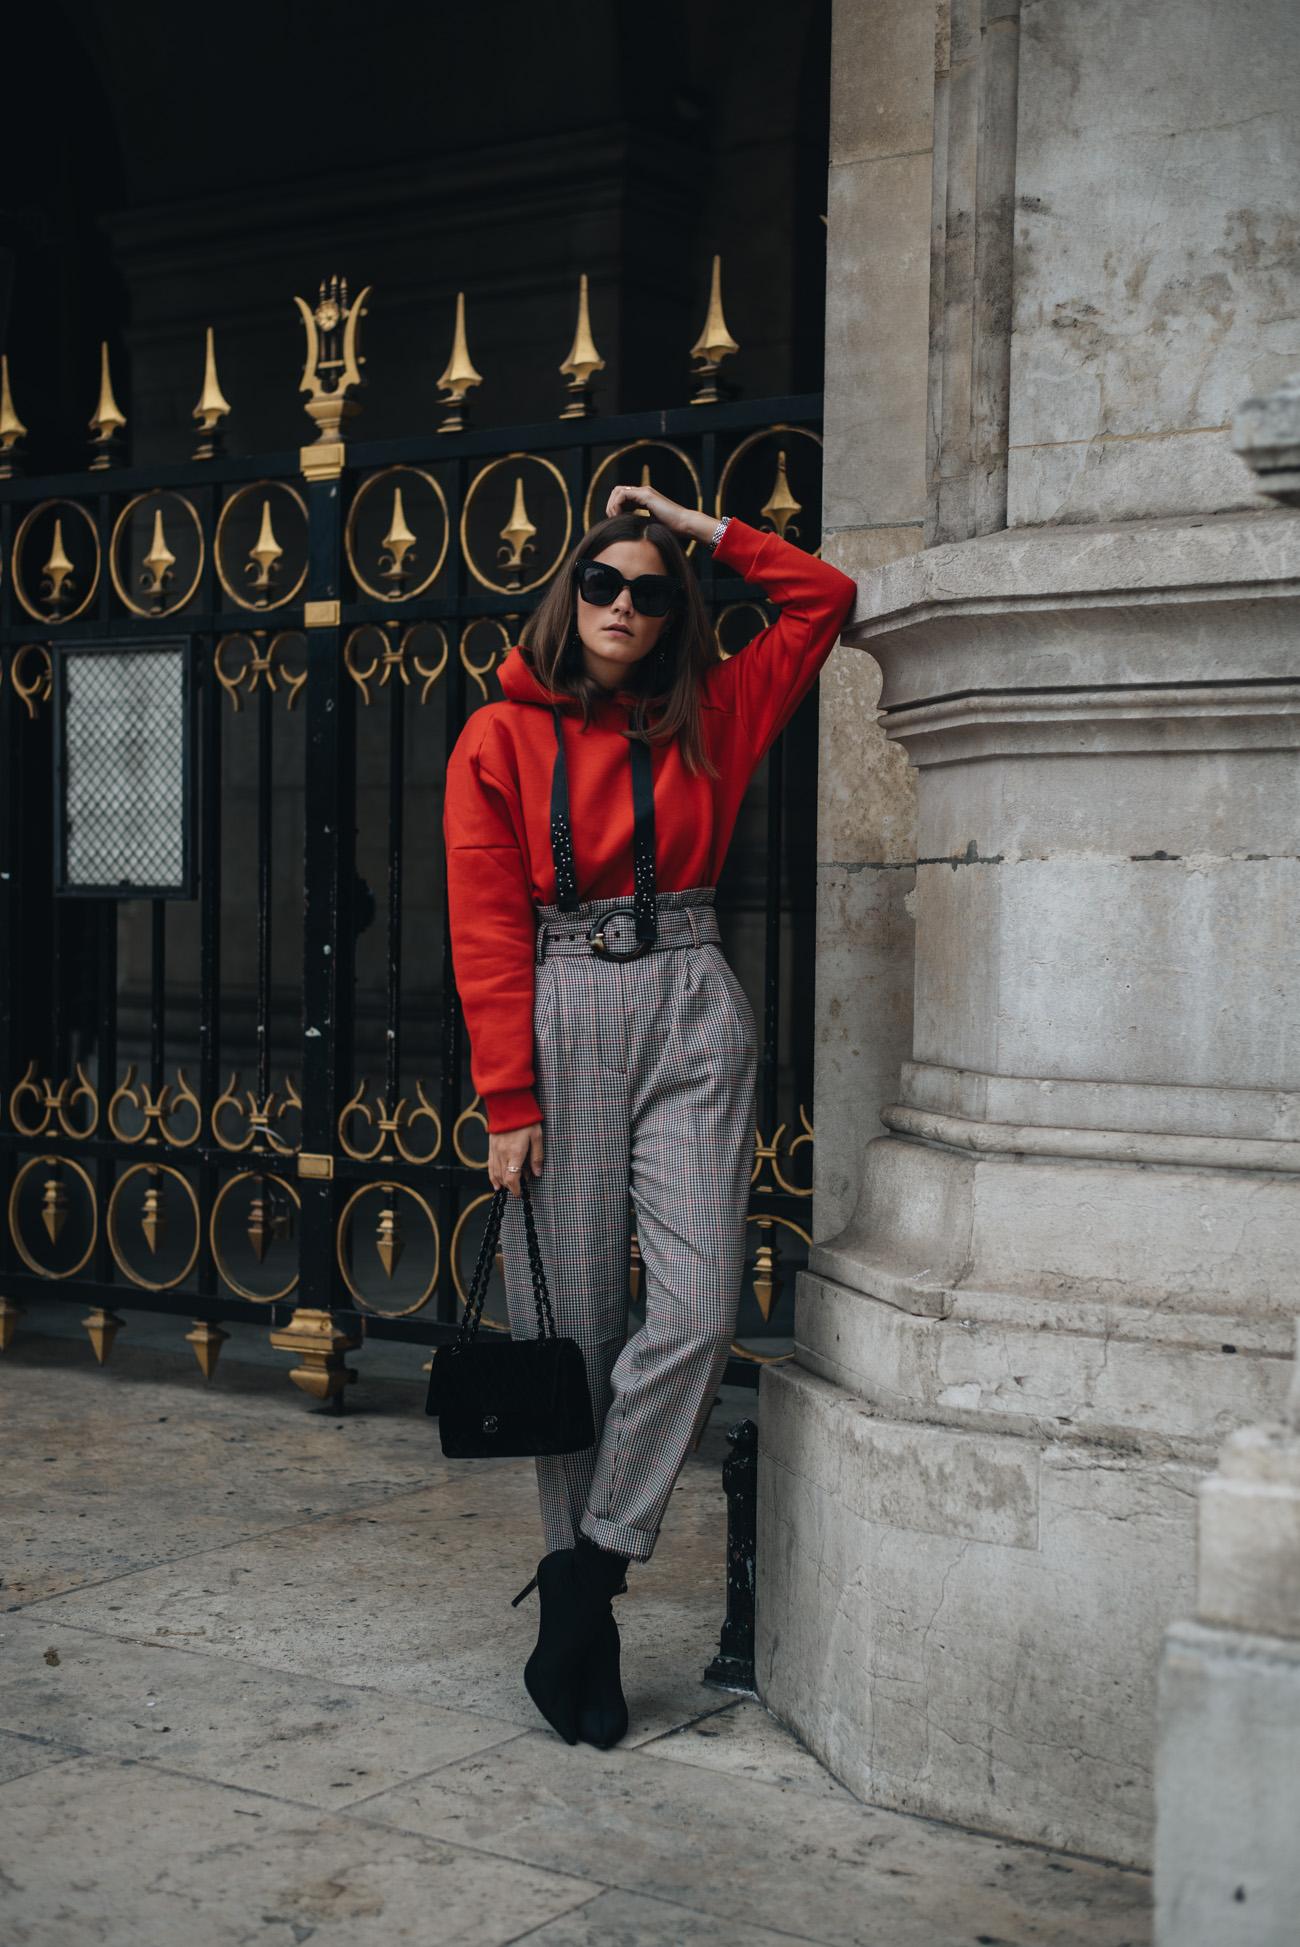 Fashion-trends-2017-streetstyle-roter-kapuzen-pullover-schwarze-chanel-timeless-handtasche-samt-sock-boots-stretch-streetstyle-bloggerin-nina-schwichtenberg-fashiioncarpet